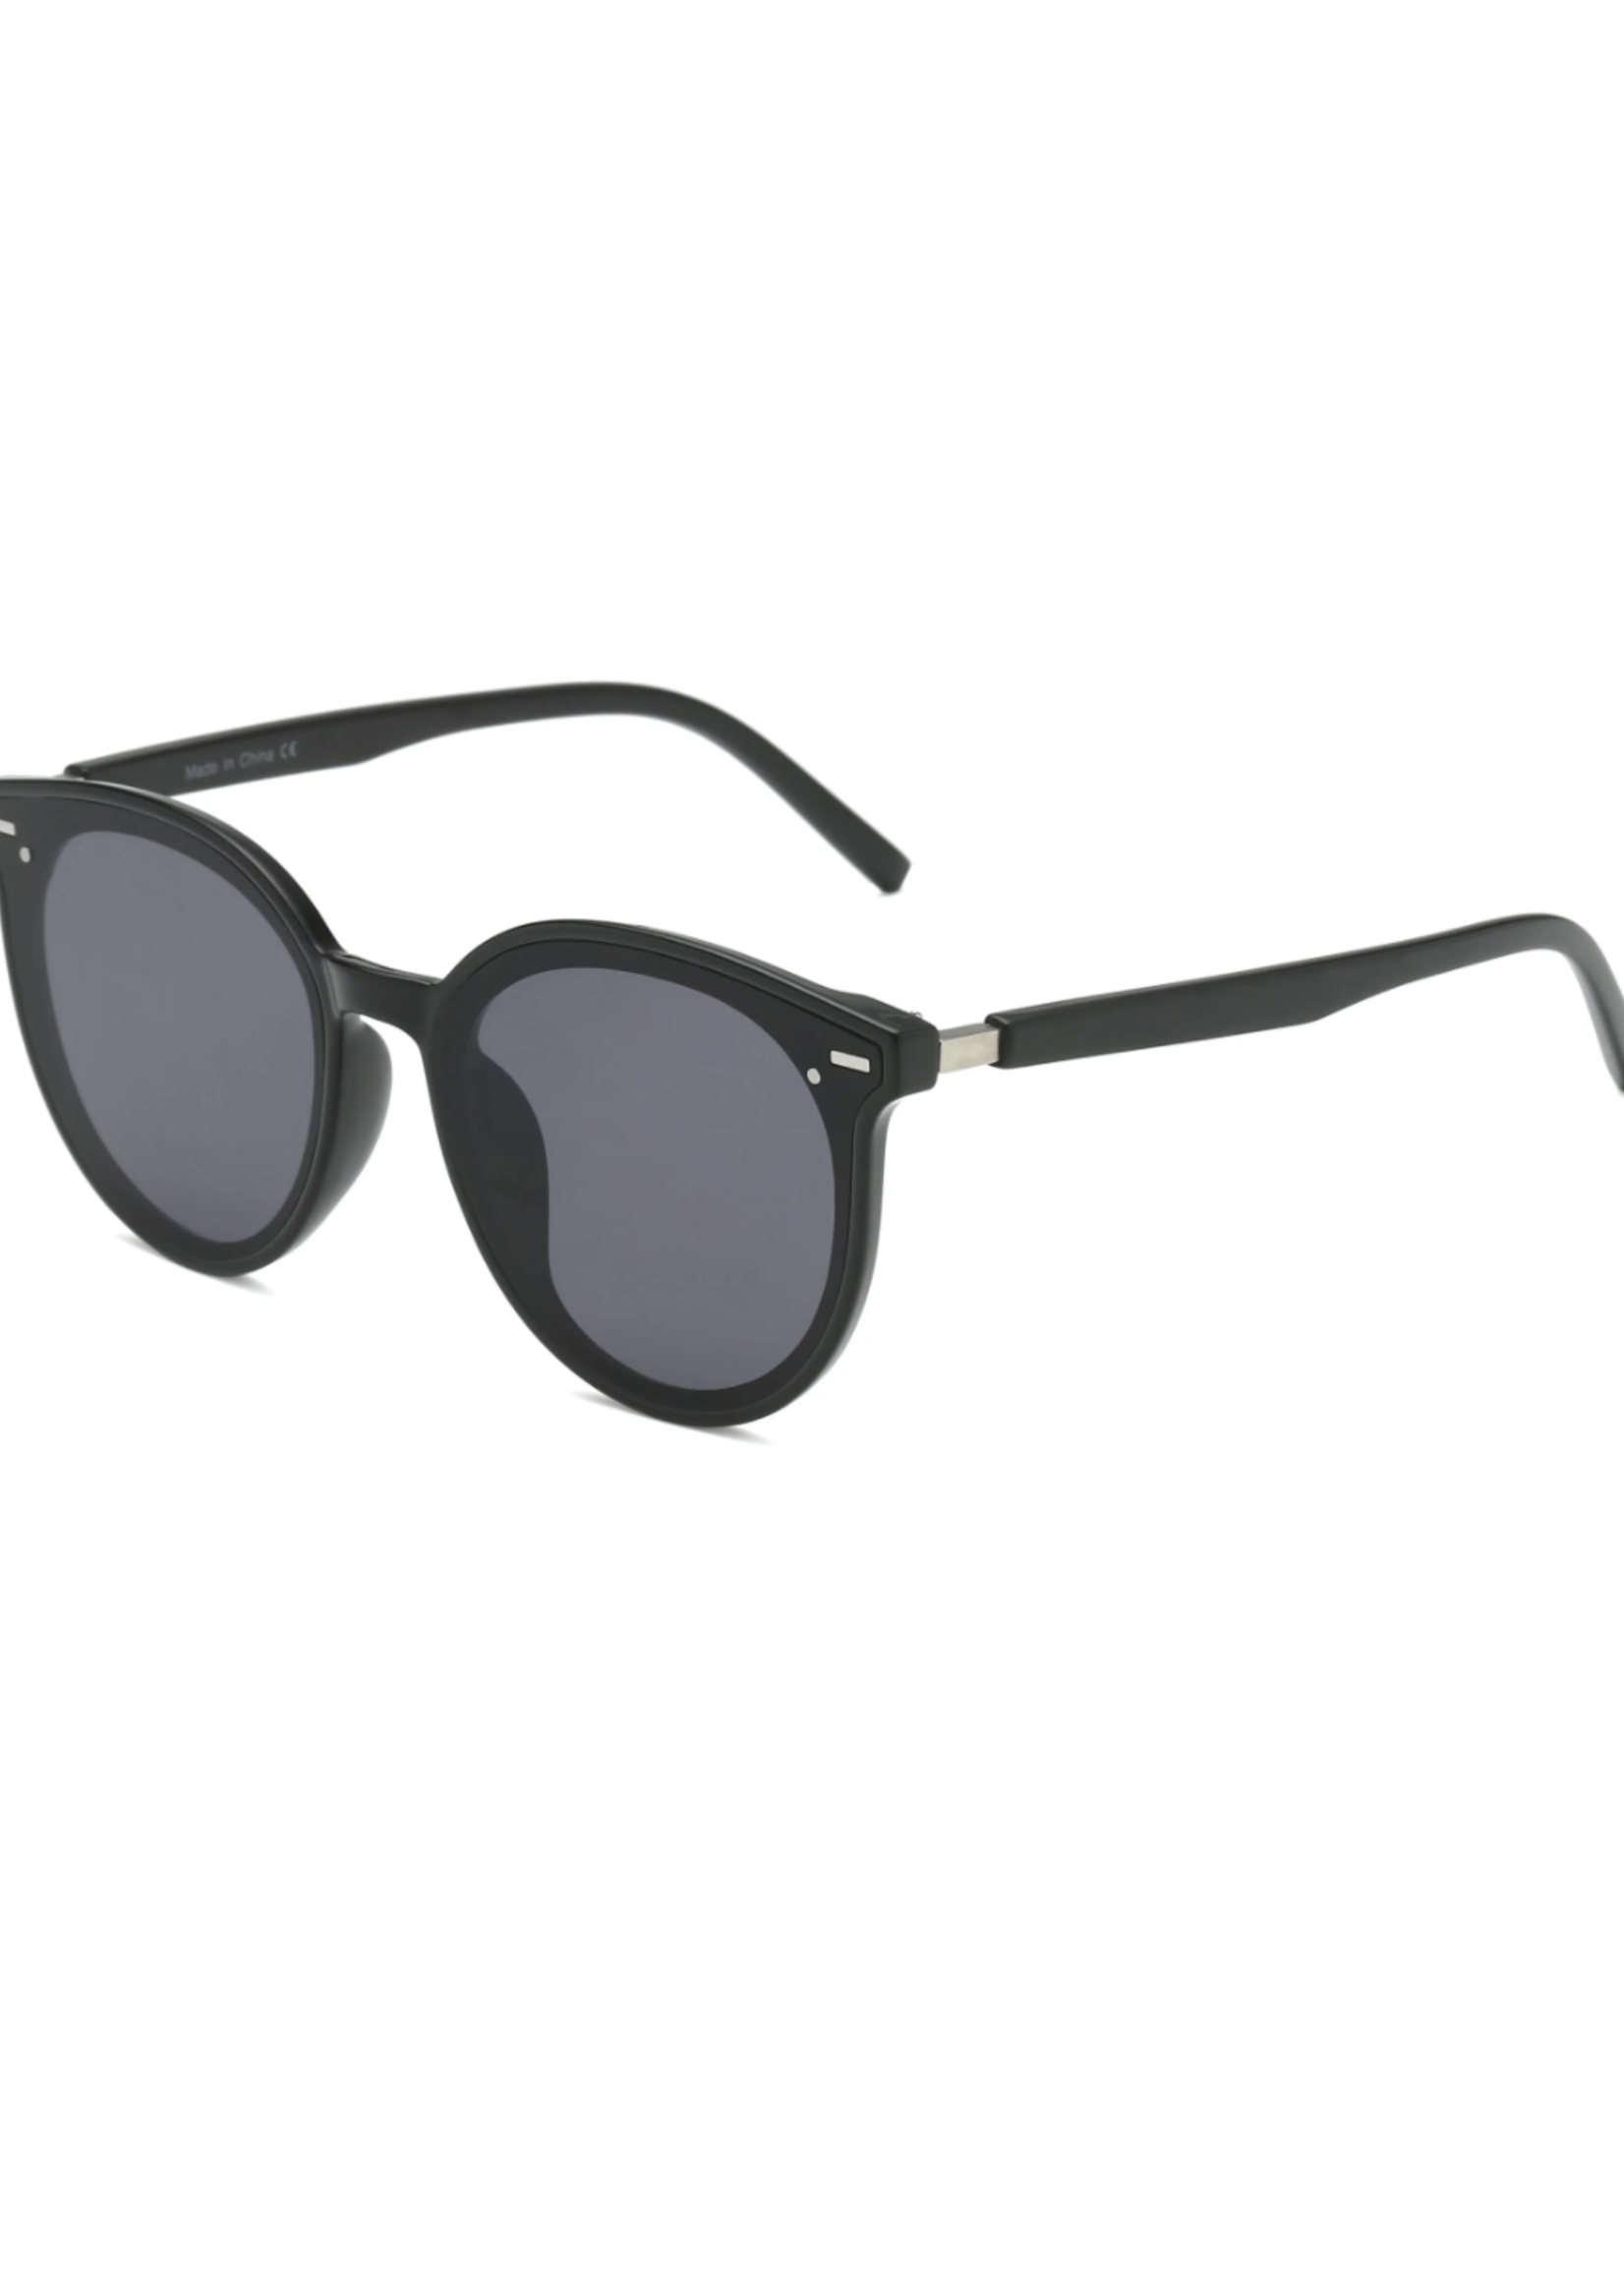 August Avenue Eyewear London | Rounded Cat Eye Sunglasses